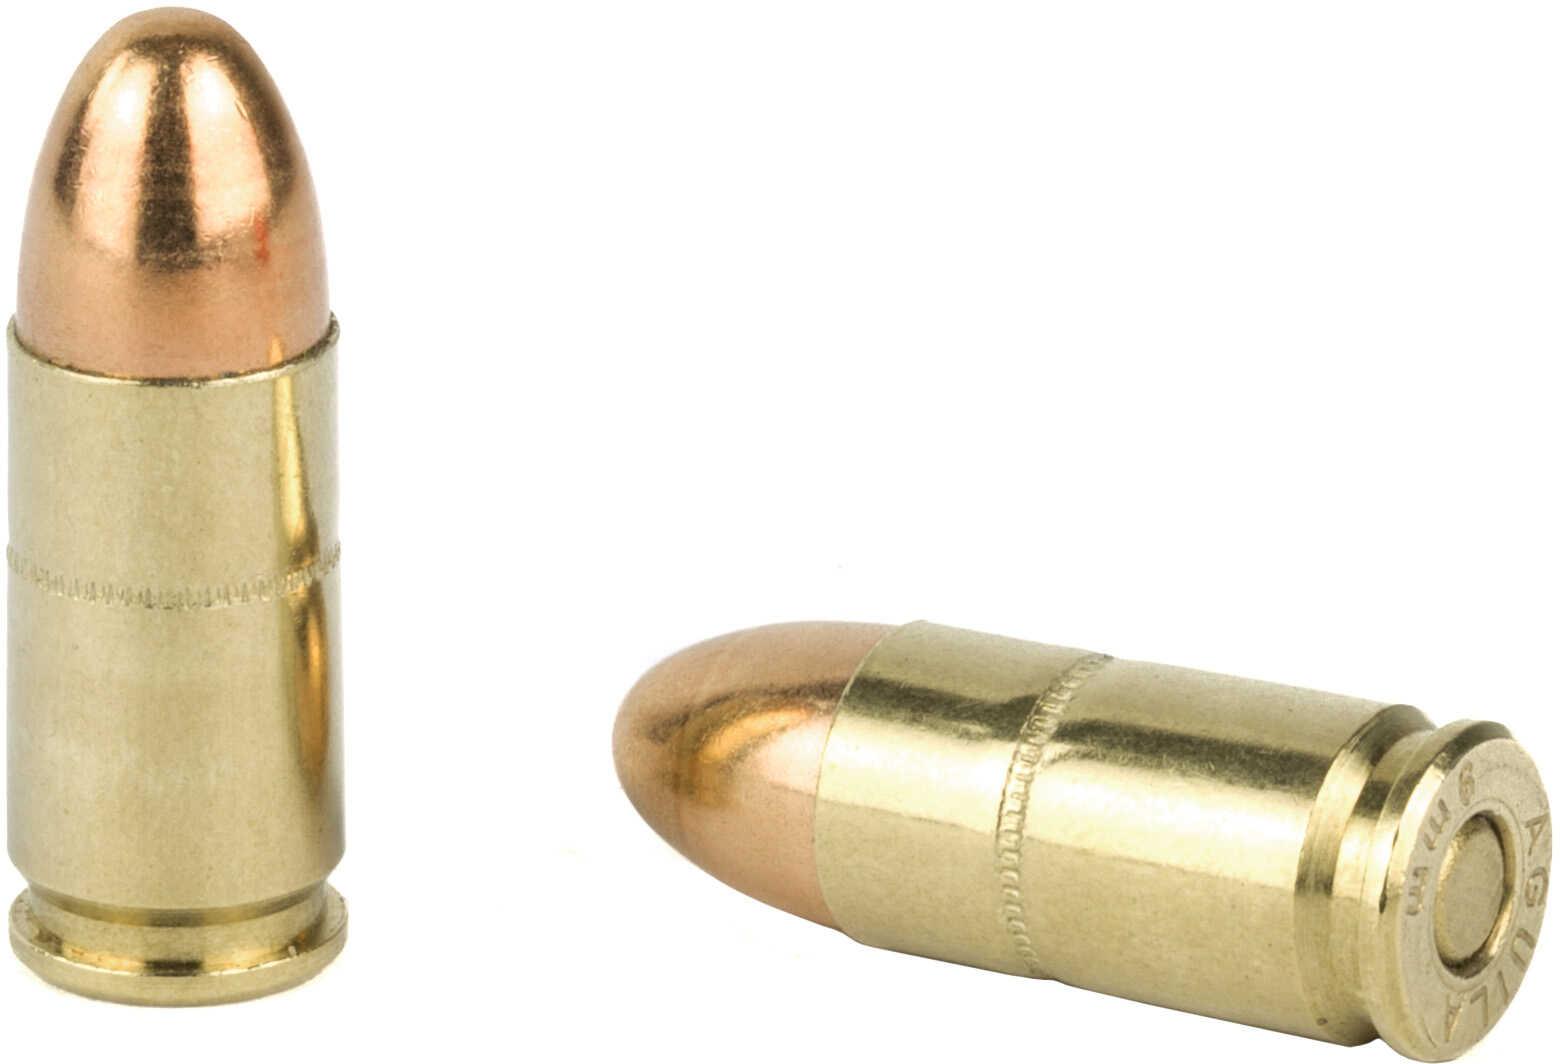 9mm Luger 124 Grain Full Metal Jacket Aguila 50 Rounds Ammunition